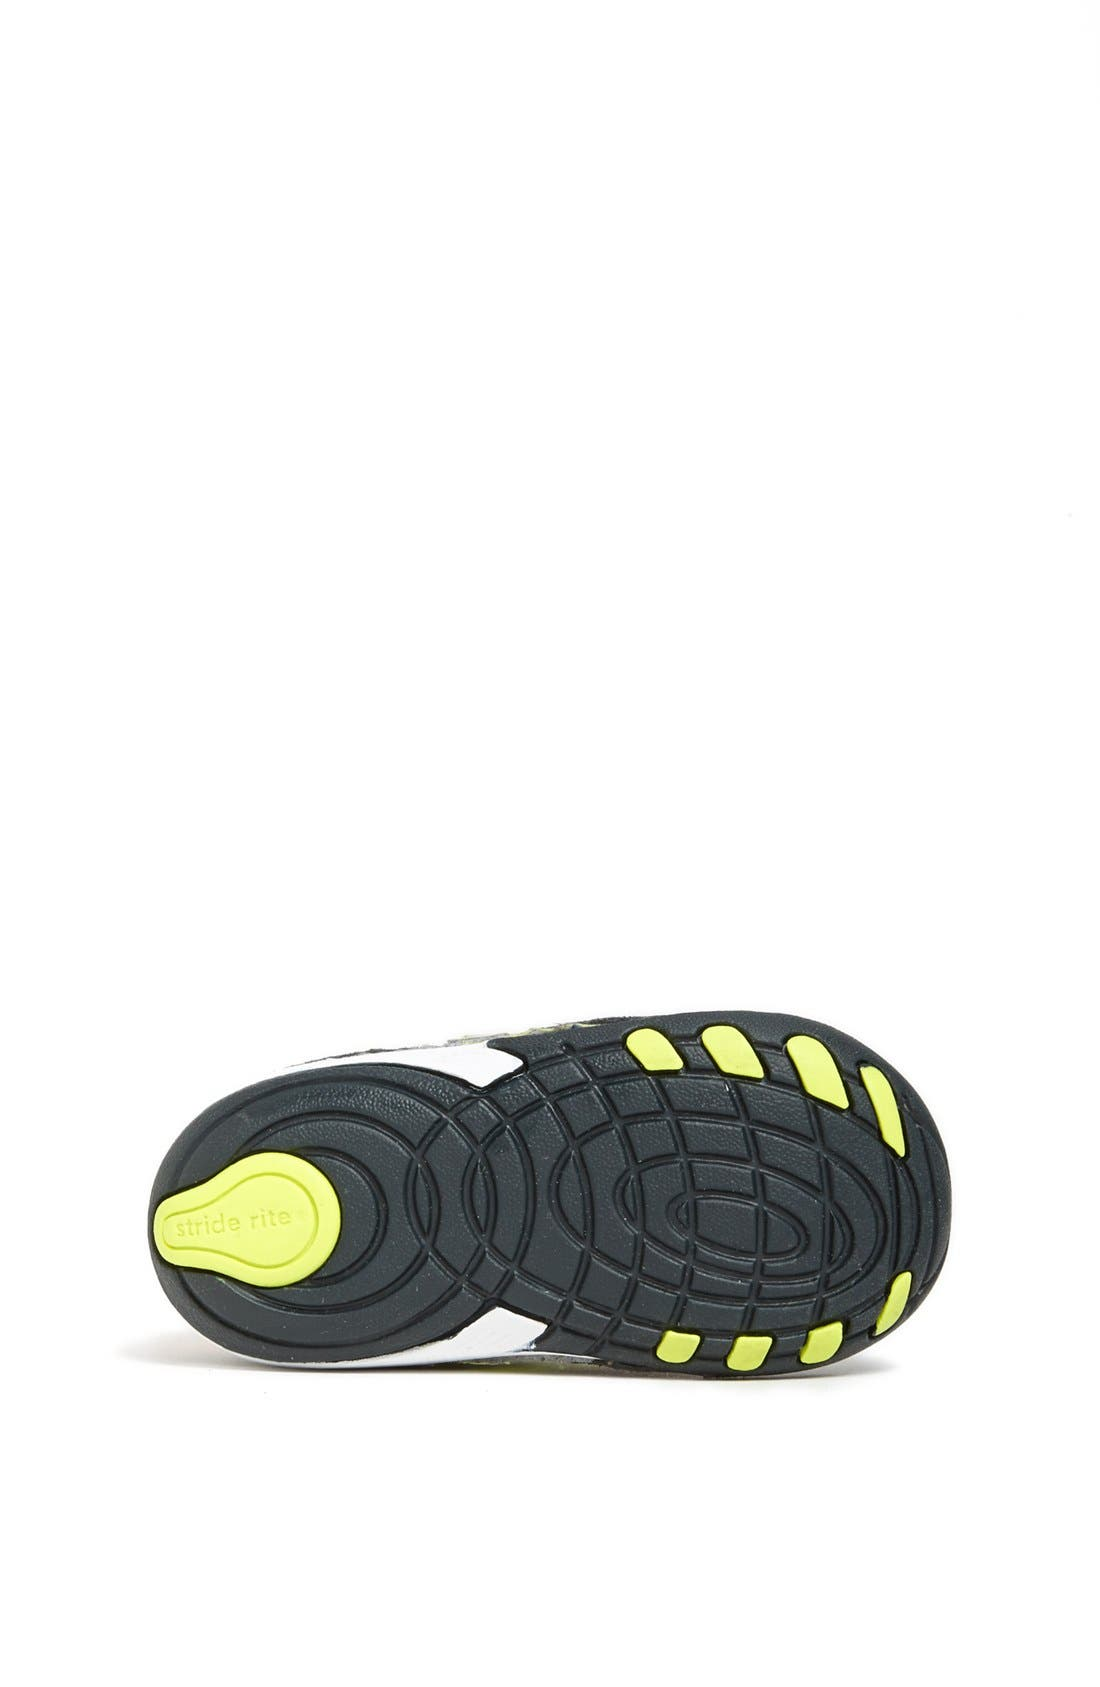 Alternate Image 4  - Stride Rite 'Jason' Sneaker (Baby & Walker)